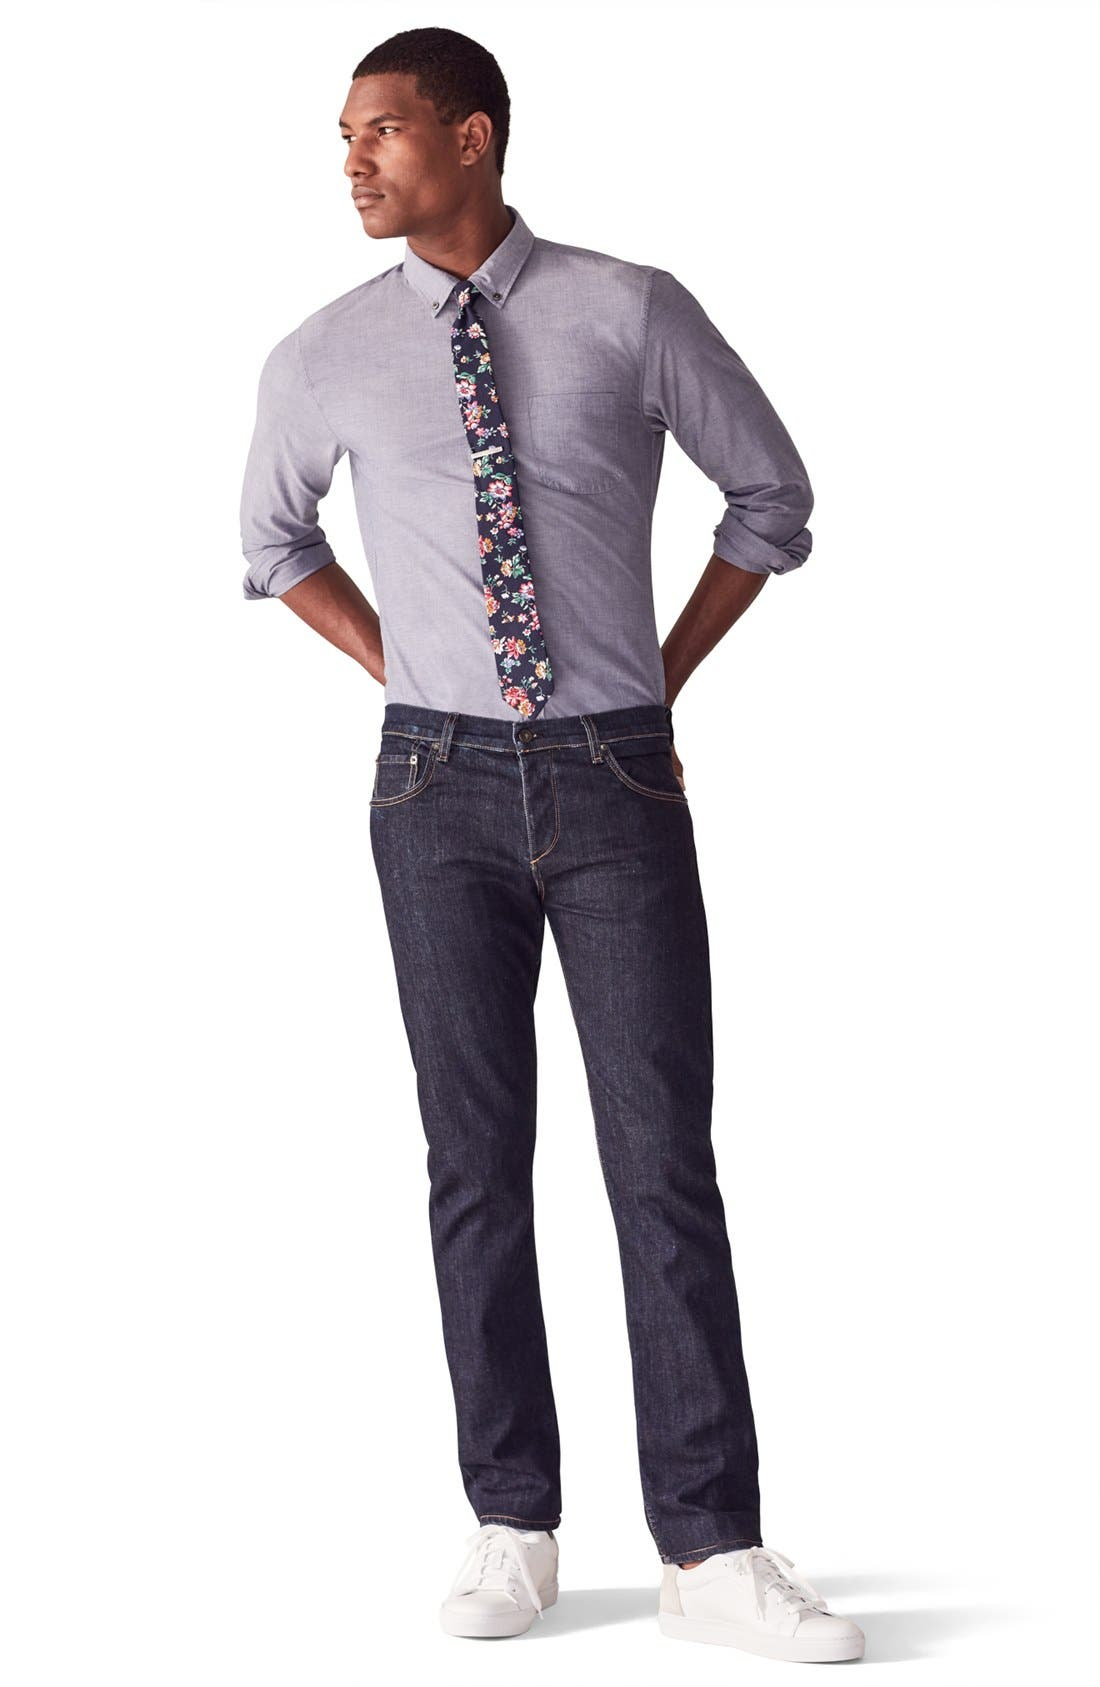 Standard Issue Fit 3 Slim Straight Leg Jeans,                             Alternate thumbnail 11, color,                             HERITAGE